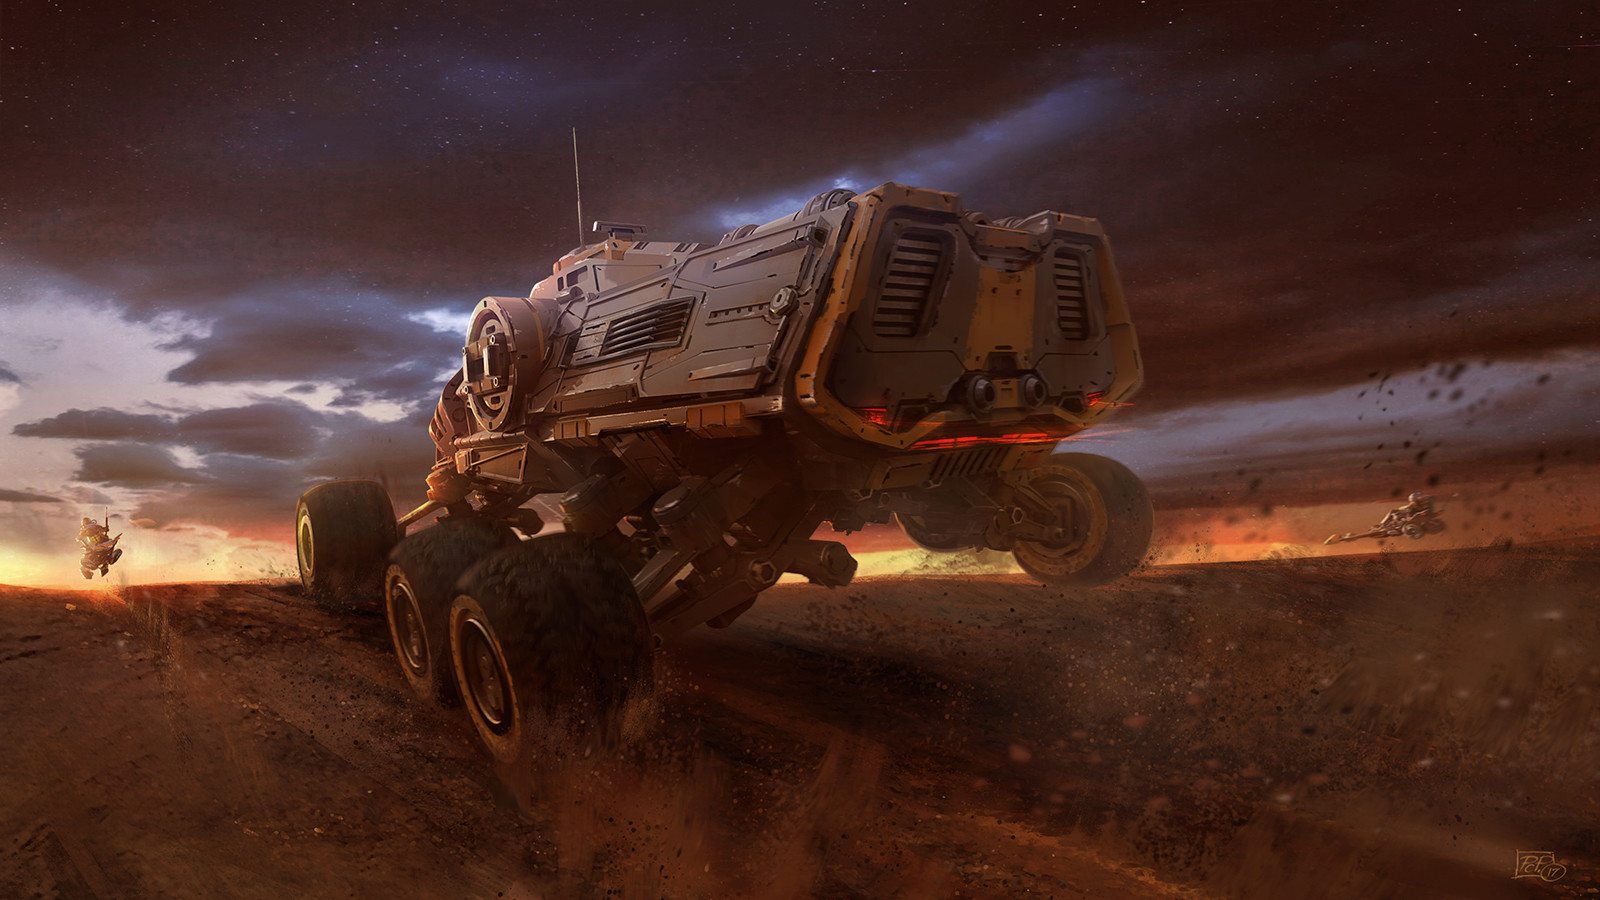 Pat presley rover spacetruck final02a